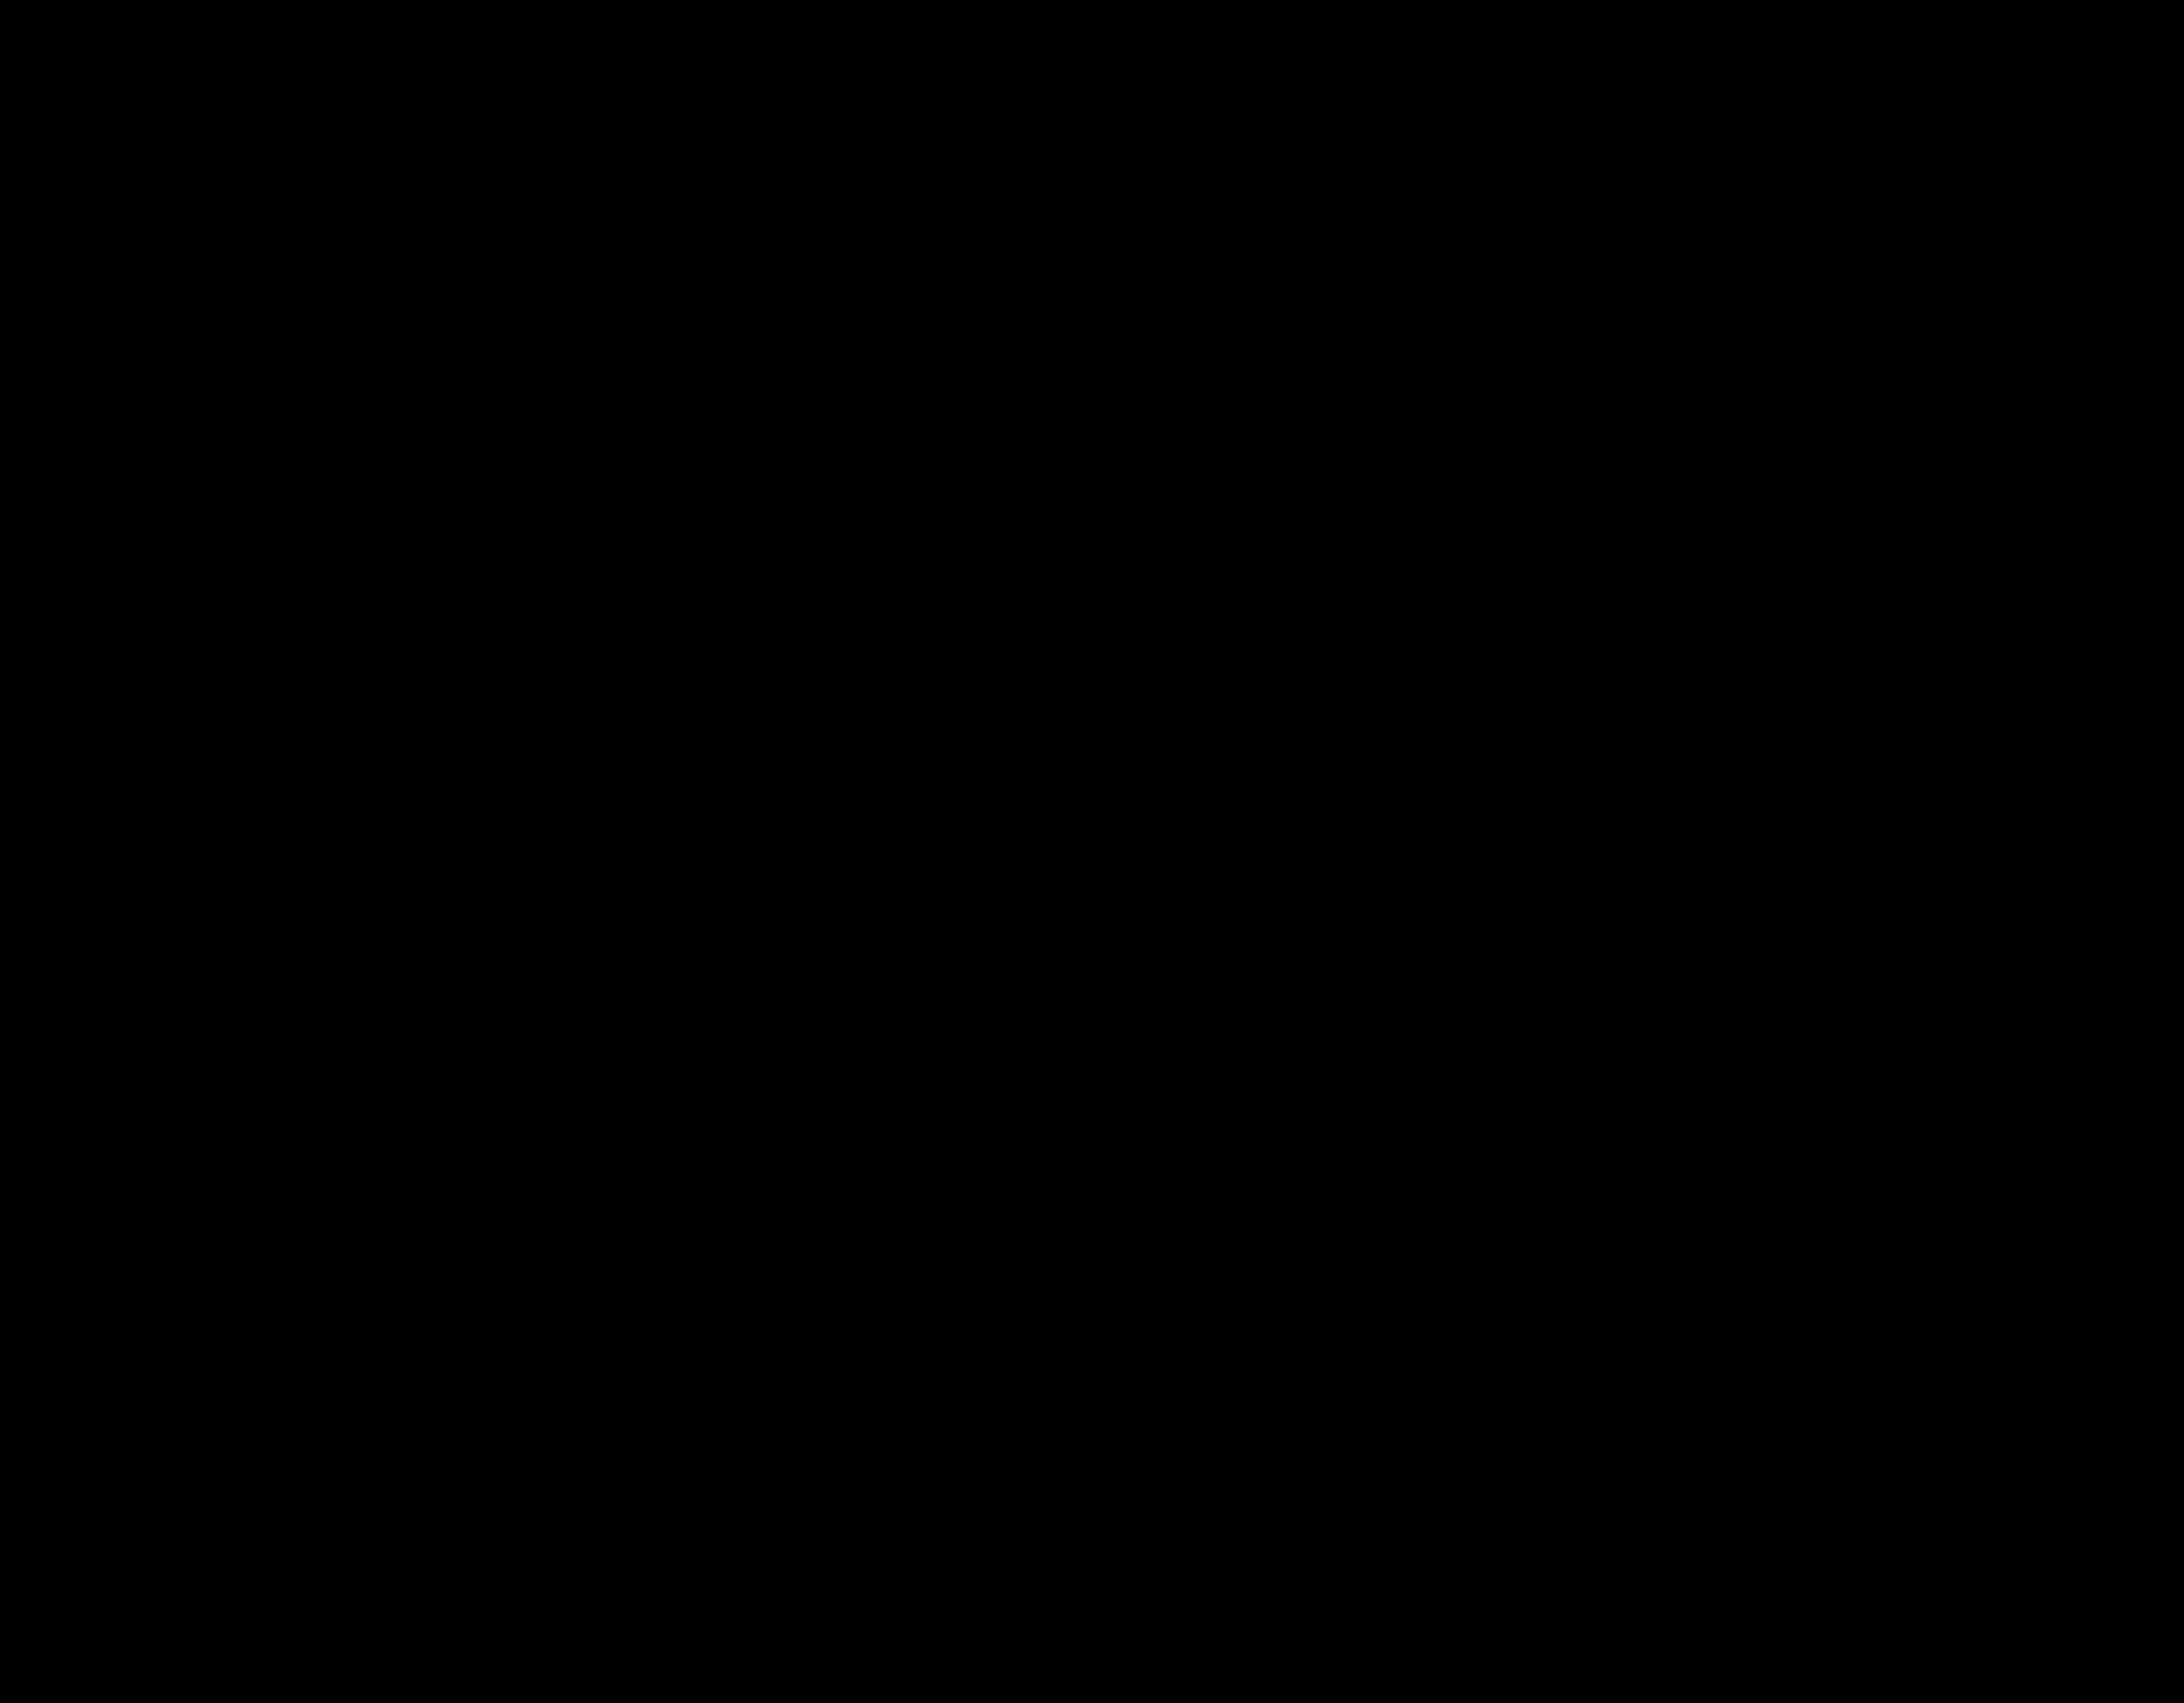 2019-01-06